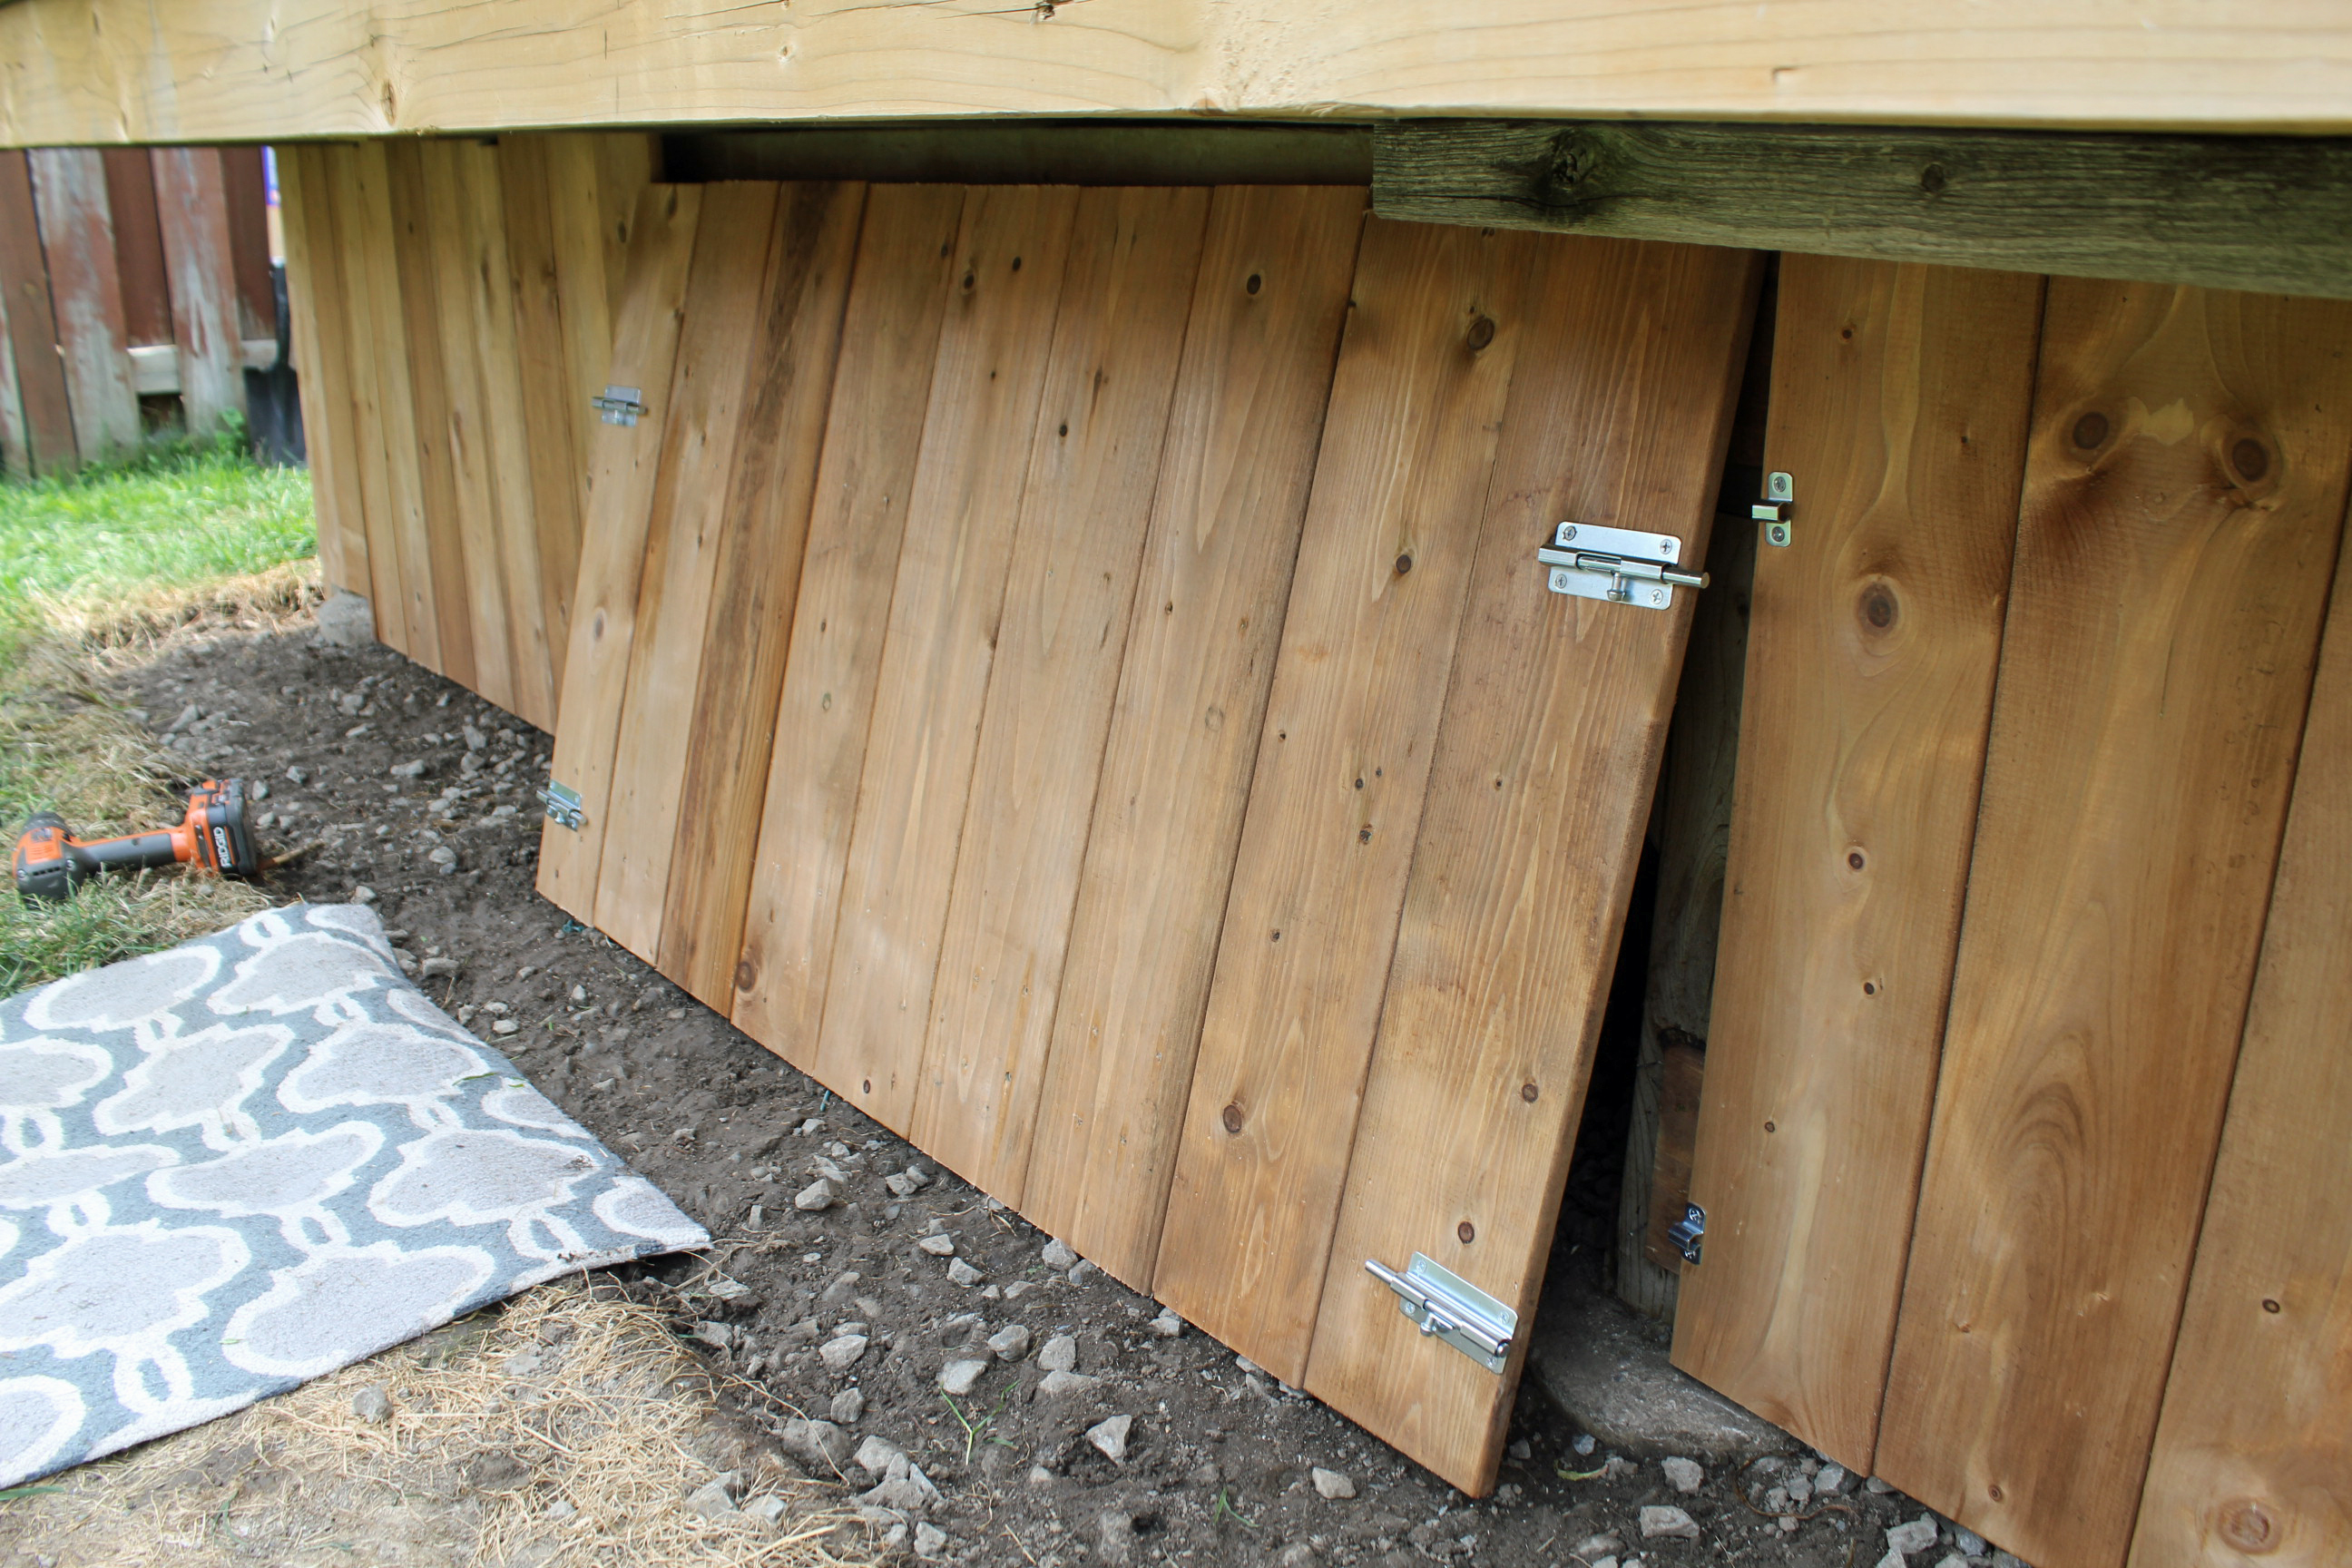 under-deck enclosure with access door